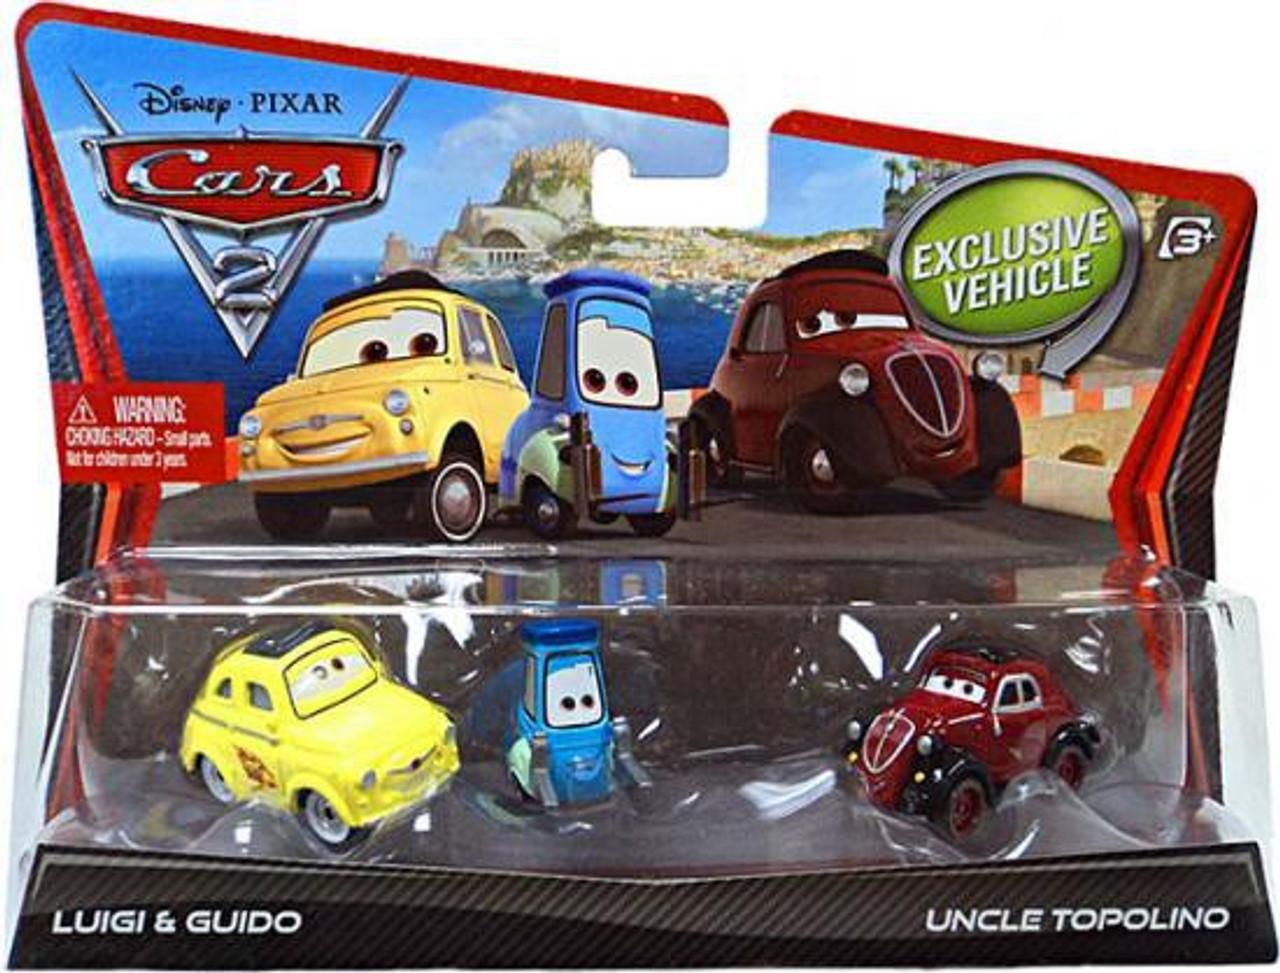 Disney Cars Cars 2 Luigi, Guido & Uncle Topolino Diecast Car 2-Pack